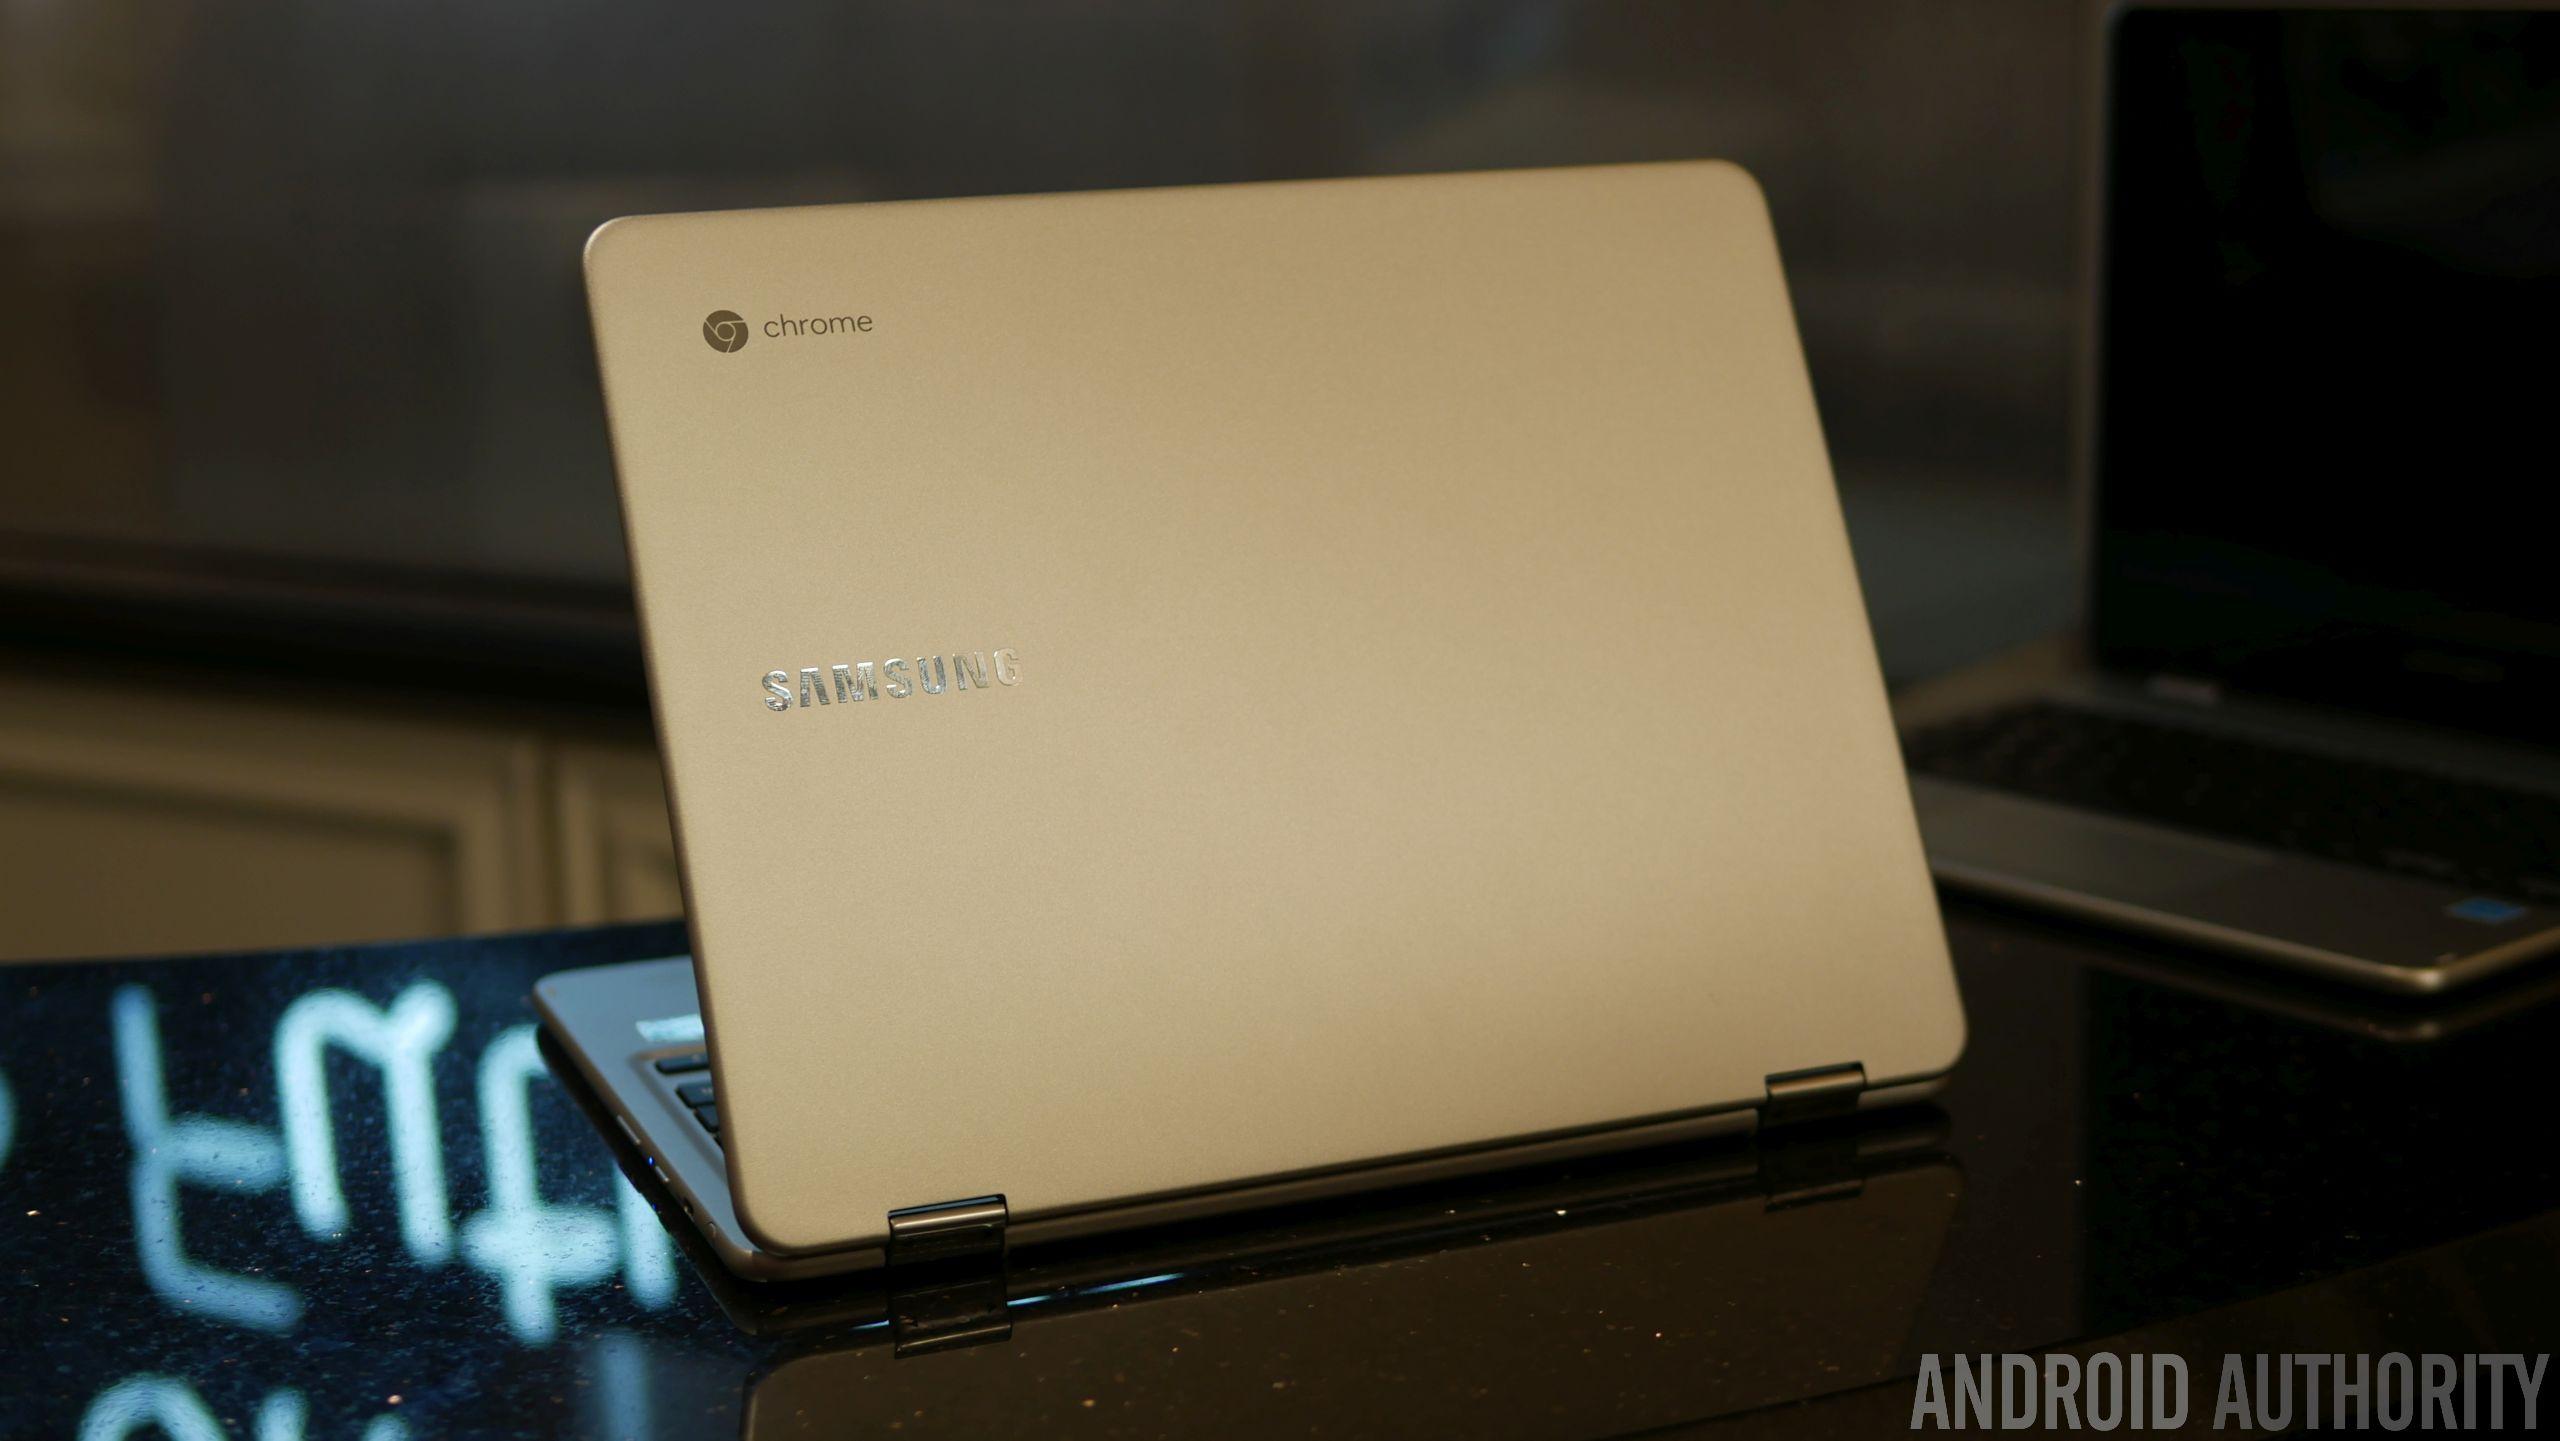 A Samsung Chromebook.